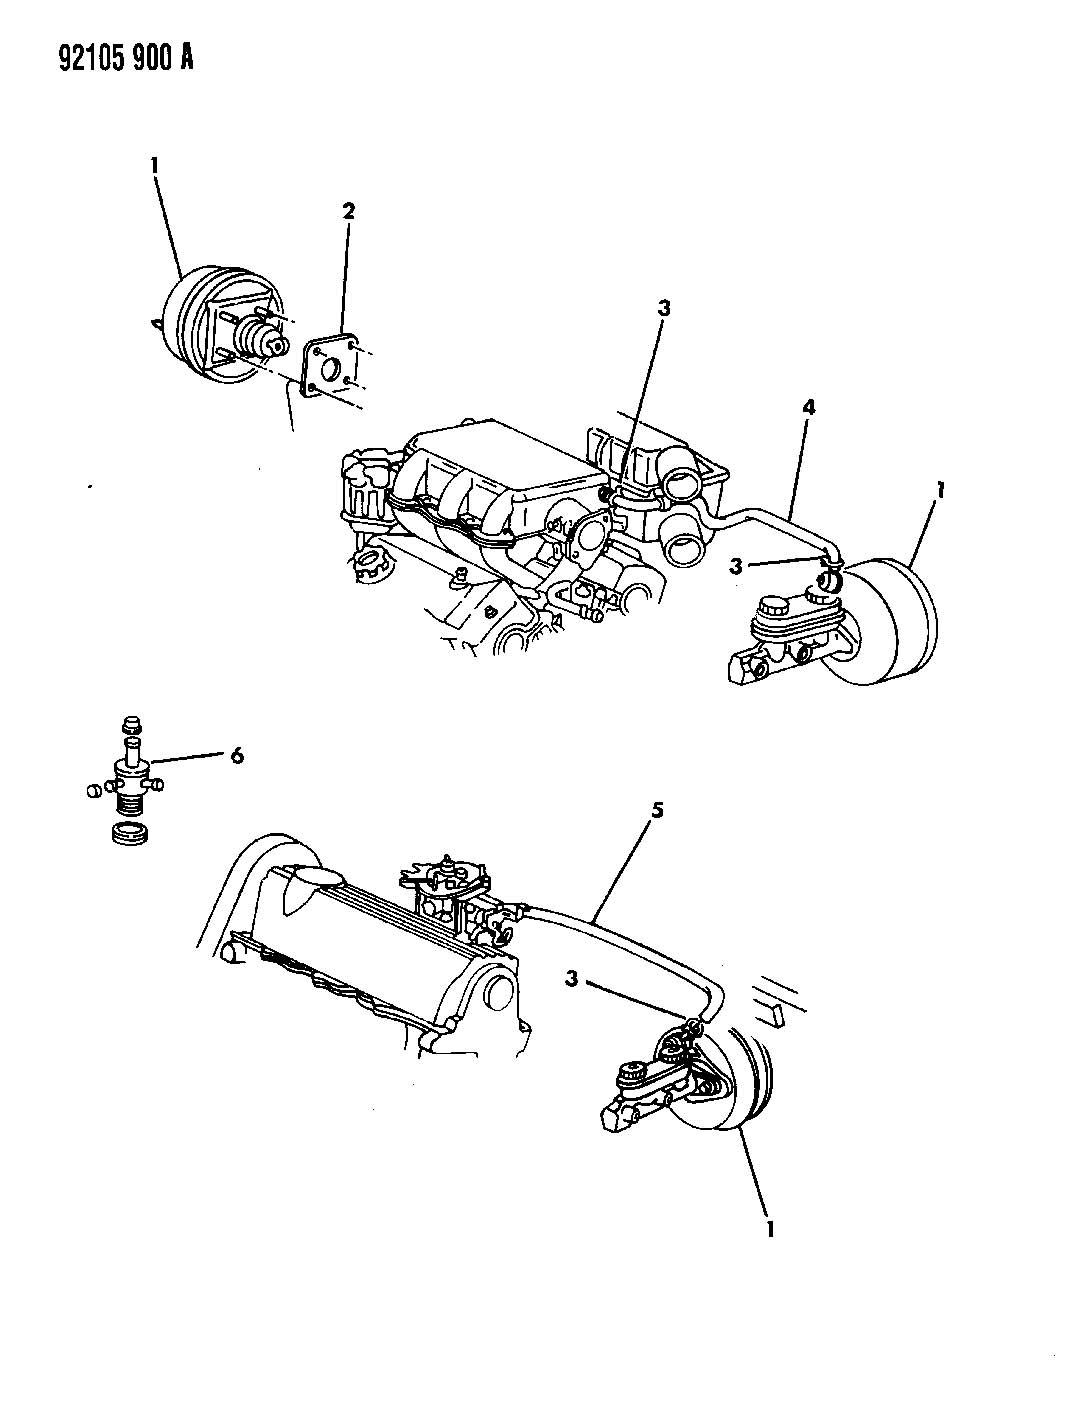 Dodge Dakota Hose Used For Fuel And Vapor 25 Foot Roll